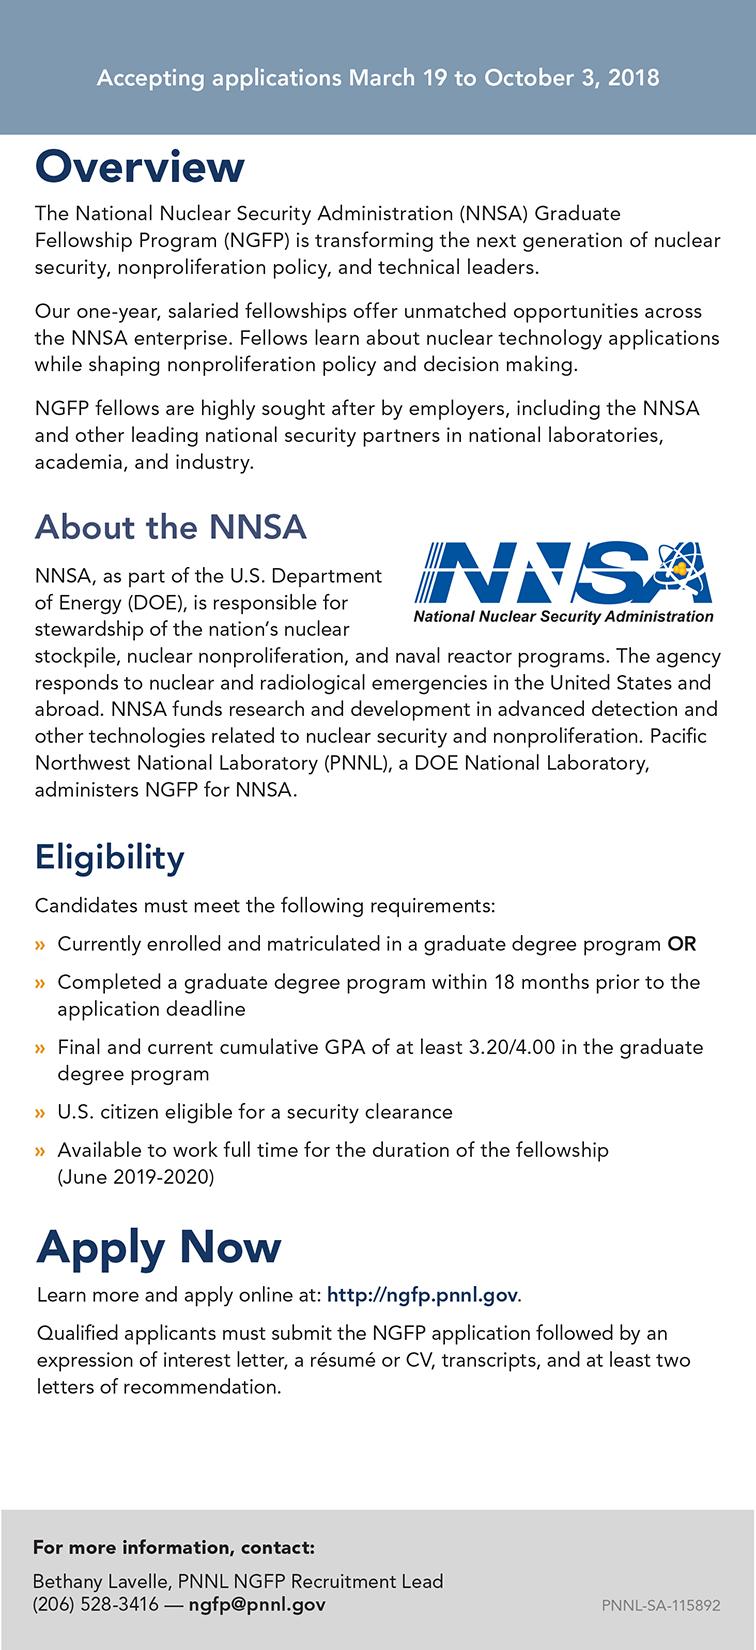 NNSA Graduate Fellowship Program Applications Open – INTA ...